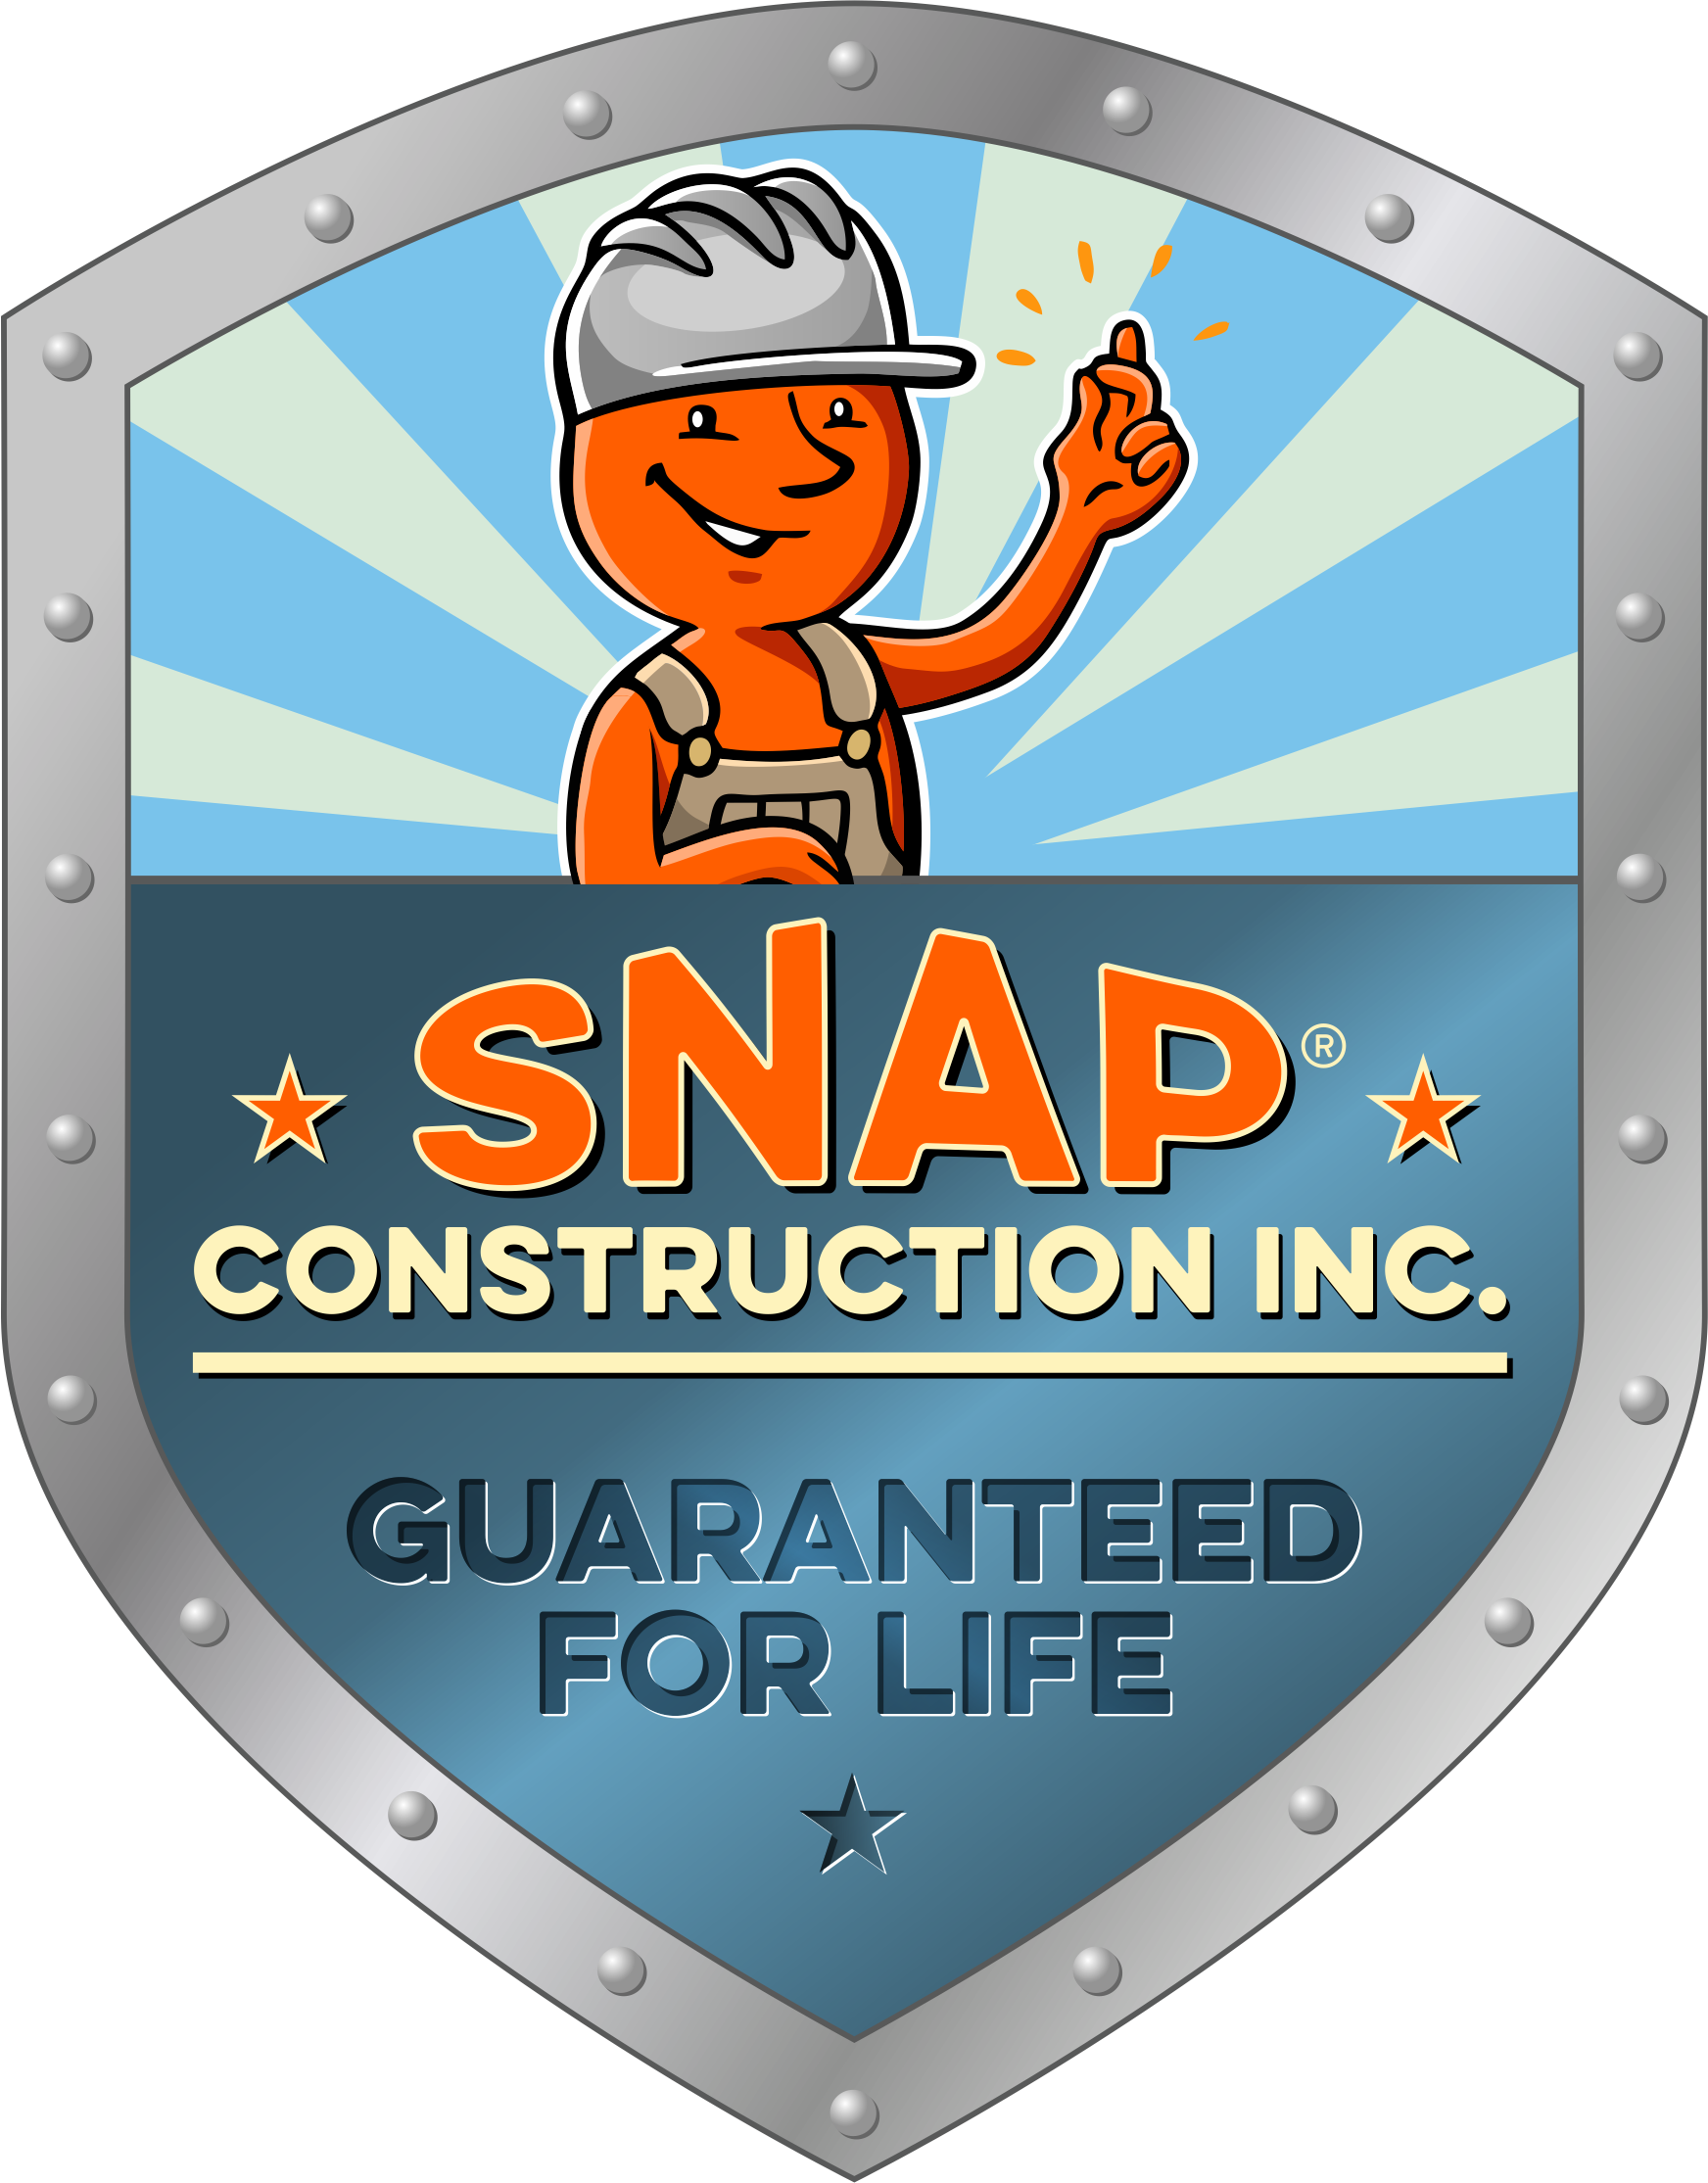 Snap Construction Inc